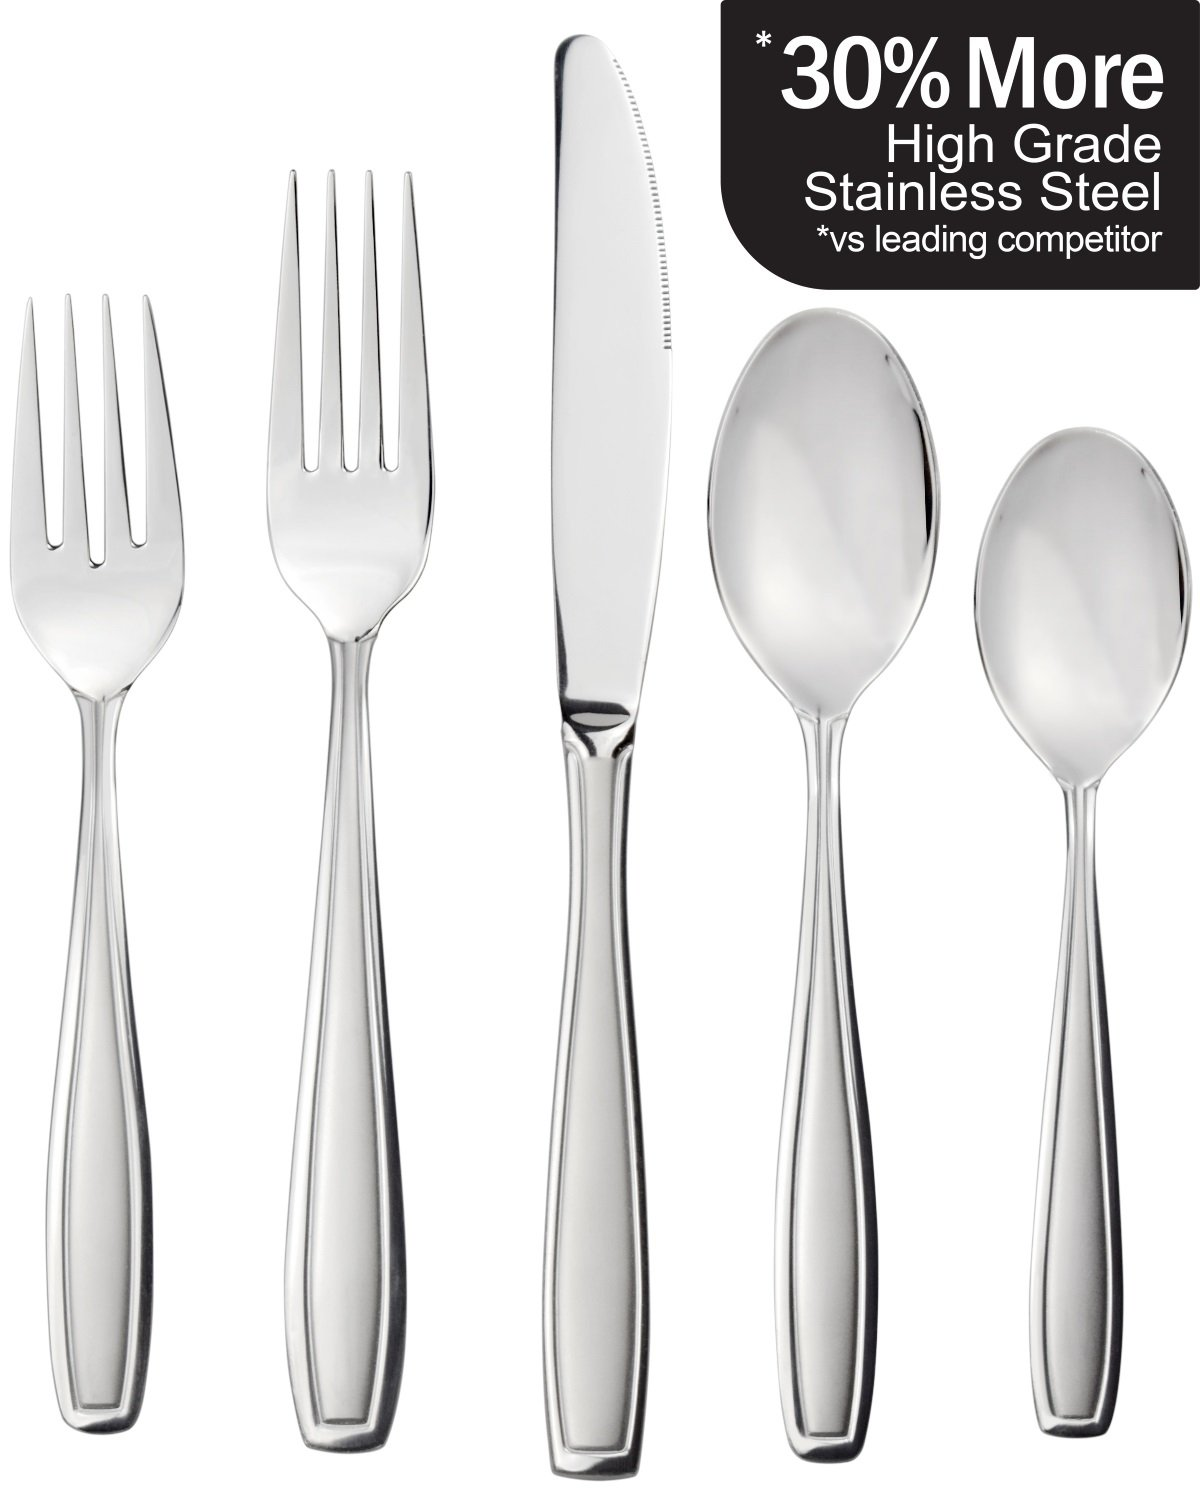 Radley & Stowe 20-Piece Flatware Solid Stainless Steel Silverware Set (Designer Grade with Matte Finish Handle)